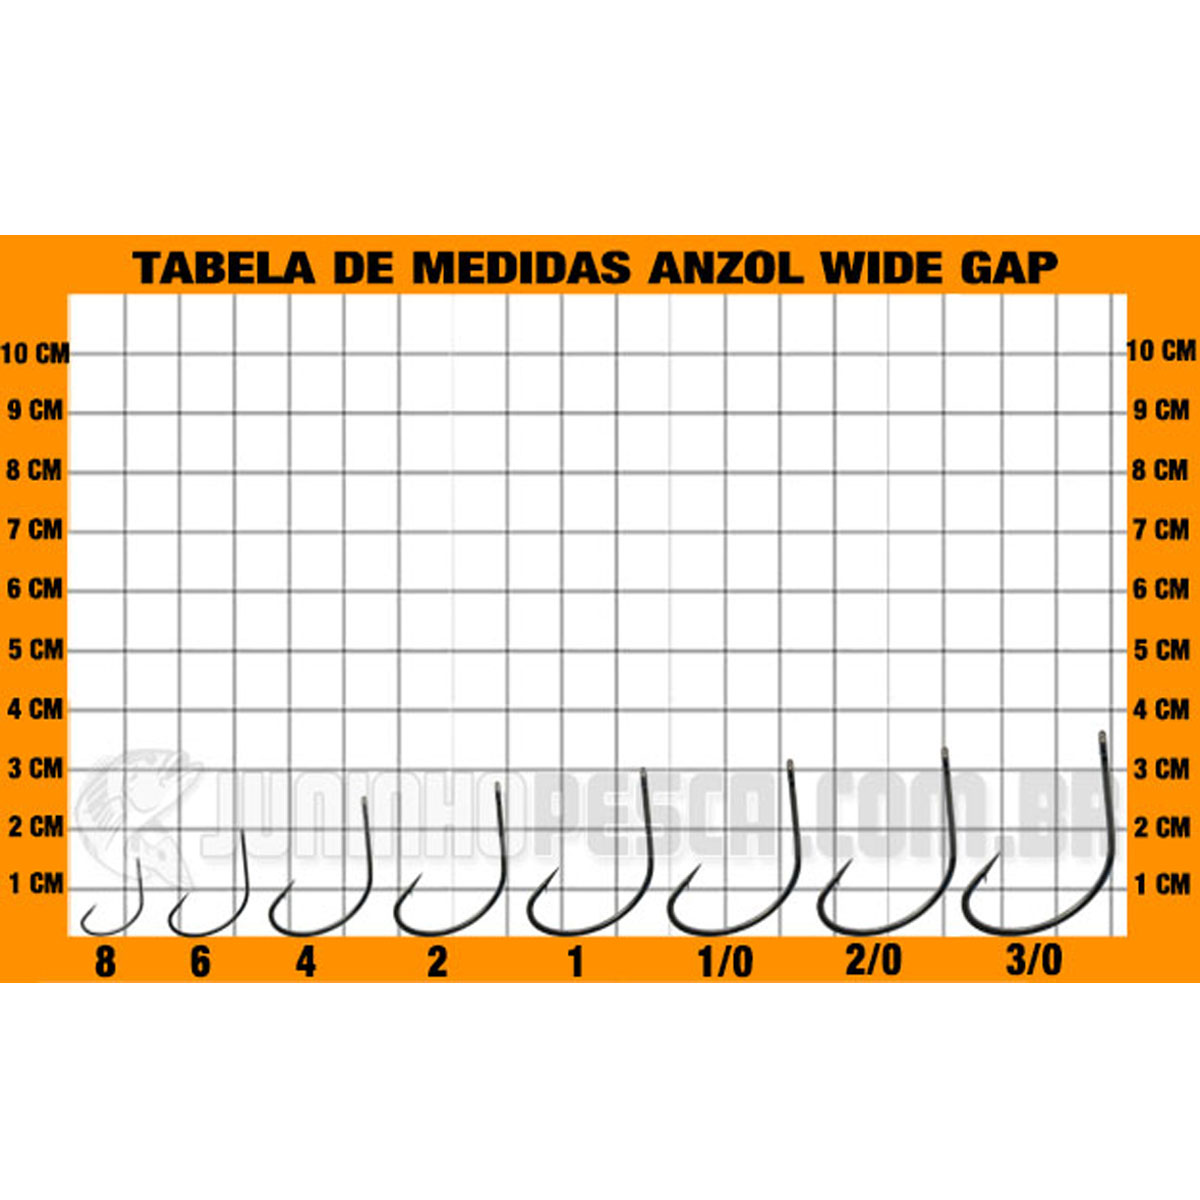 Anzol Pinnacle Wide Gap nº 02  - Pró Pesca Shop